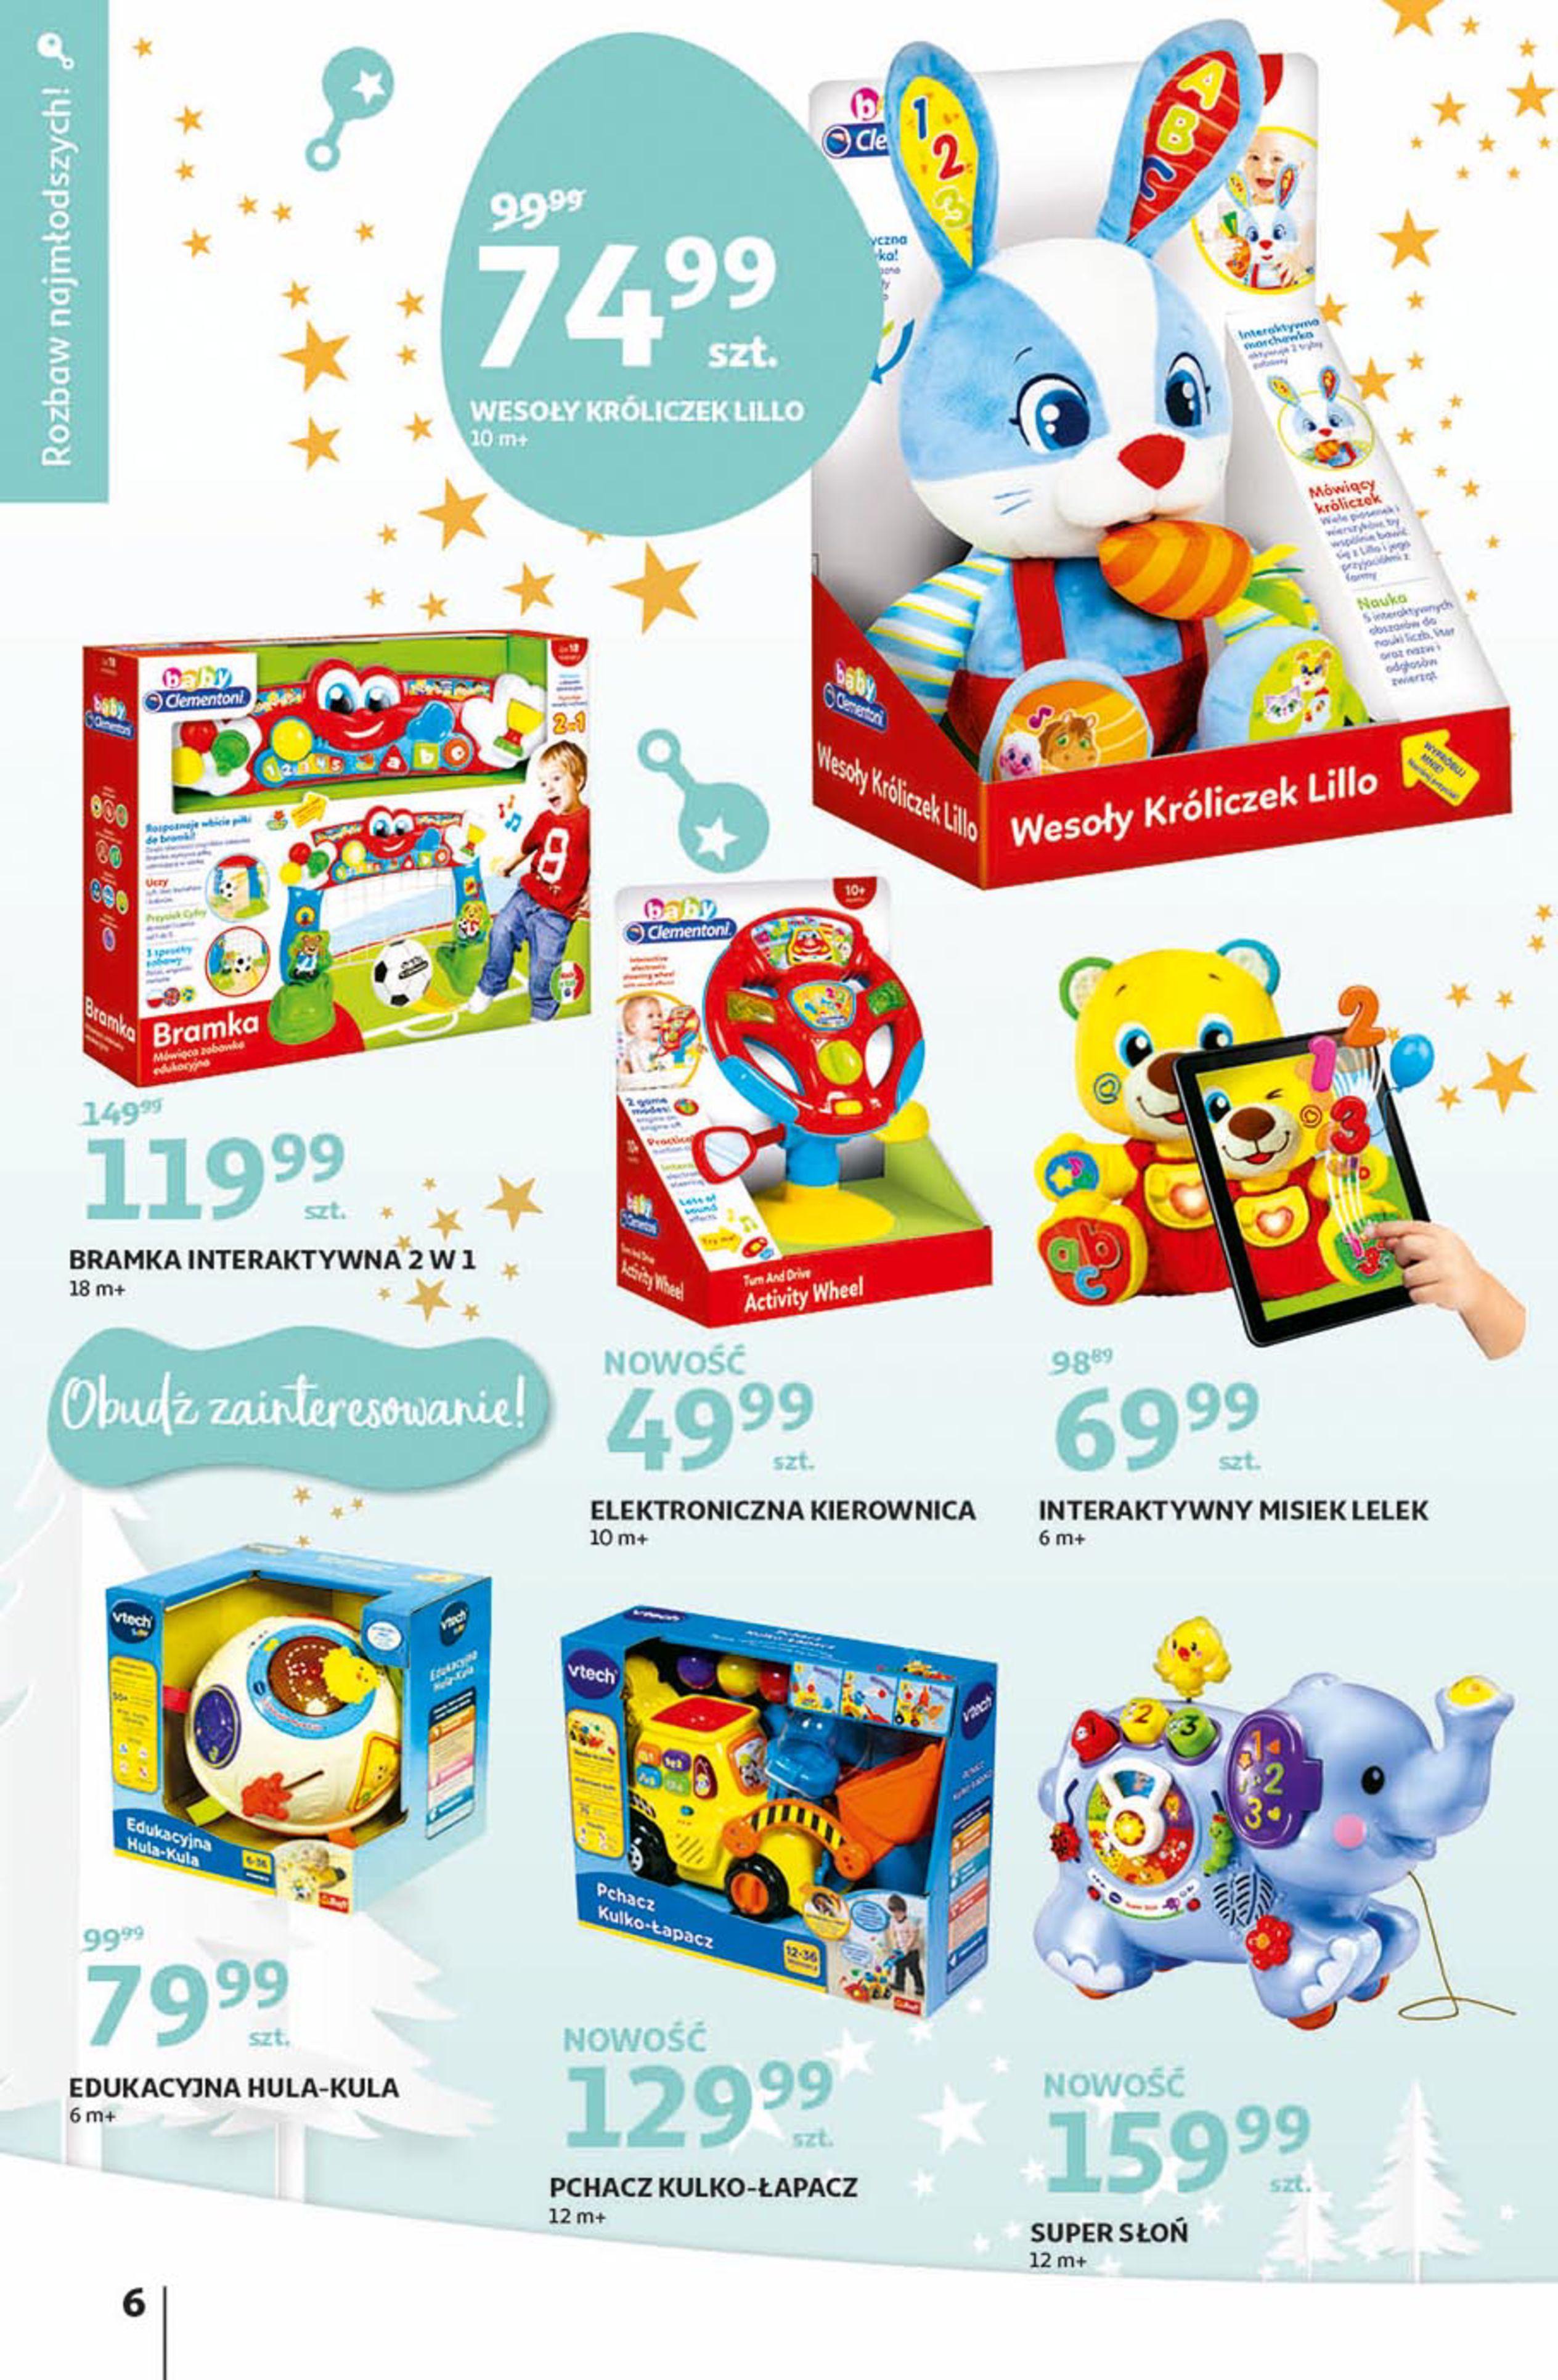 Gazetka Auchan - Magia zabawek Hipermarkety-06.11.2019-20.11.2019-page-6